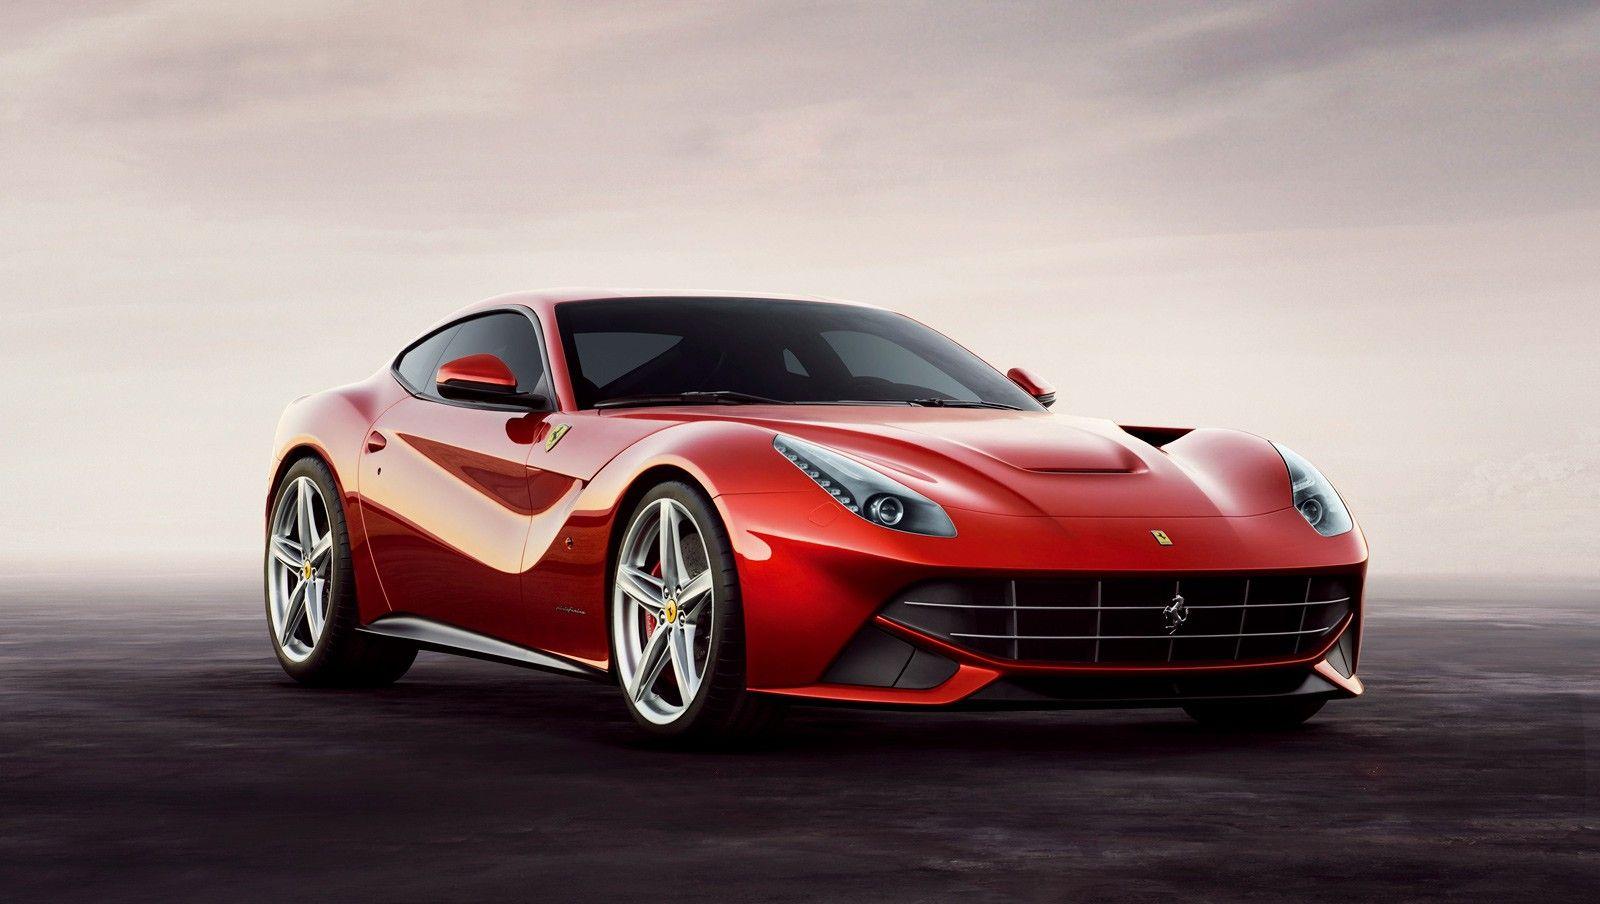 Another Ferrari, the F12 Berlinetta.